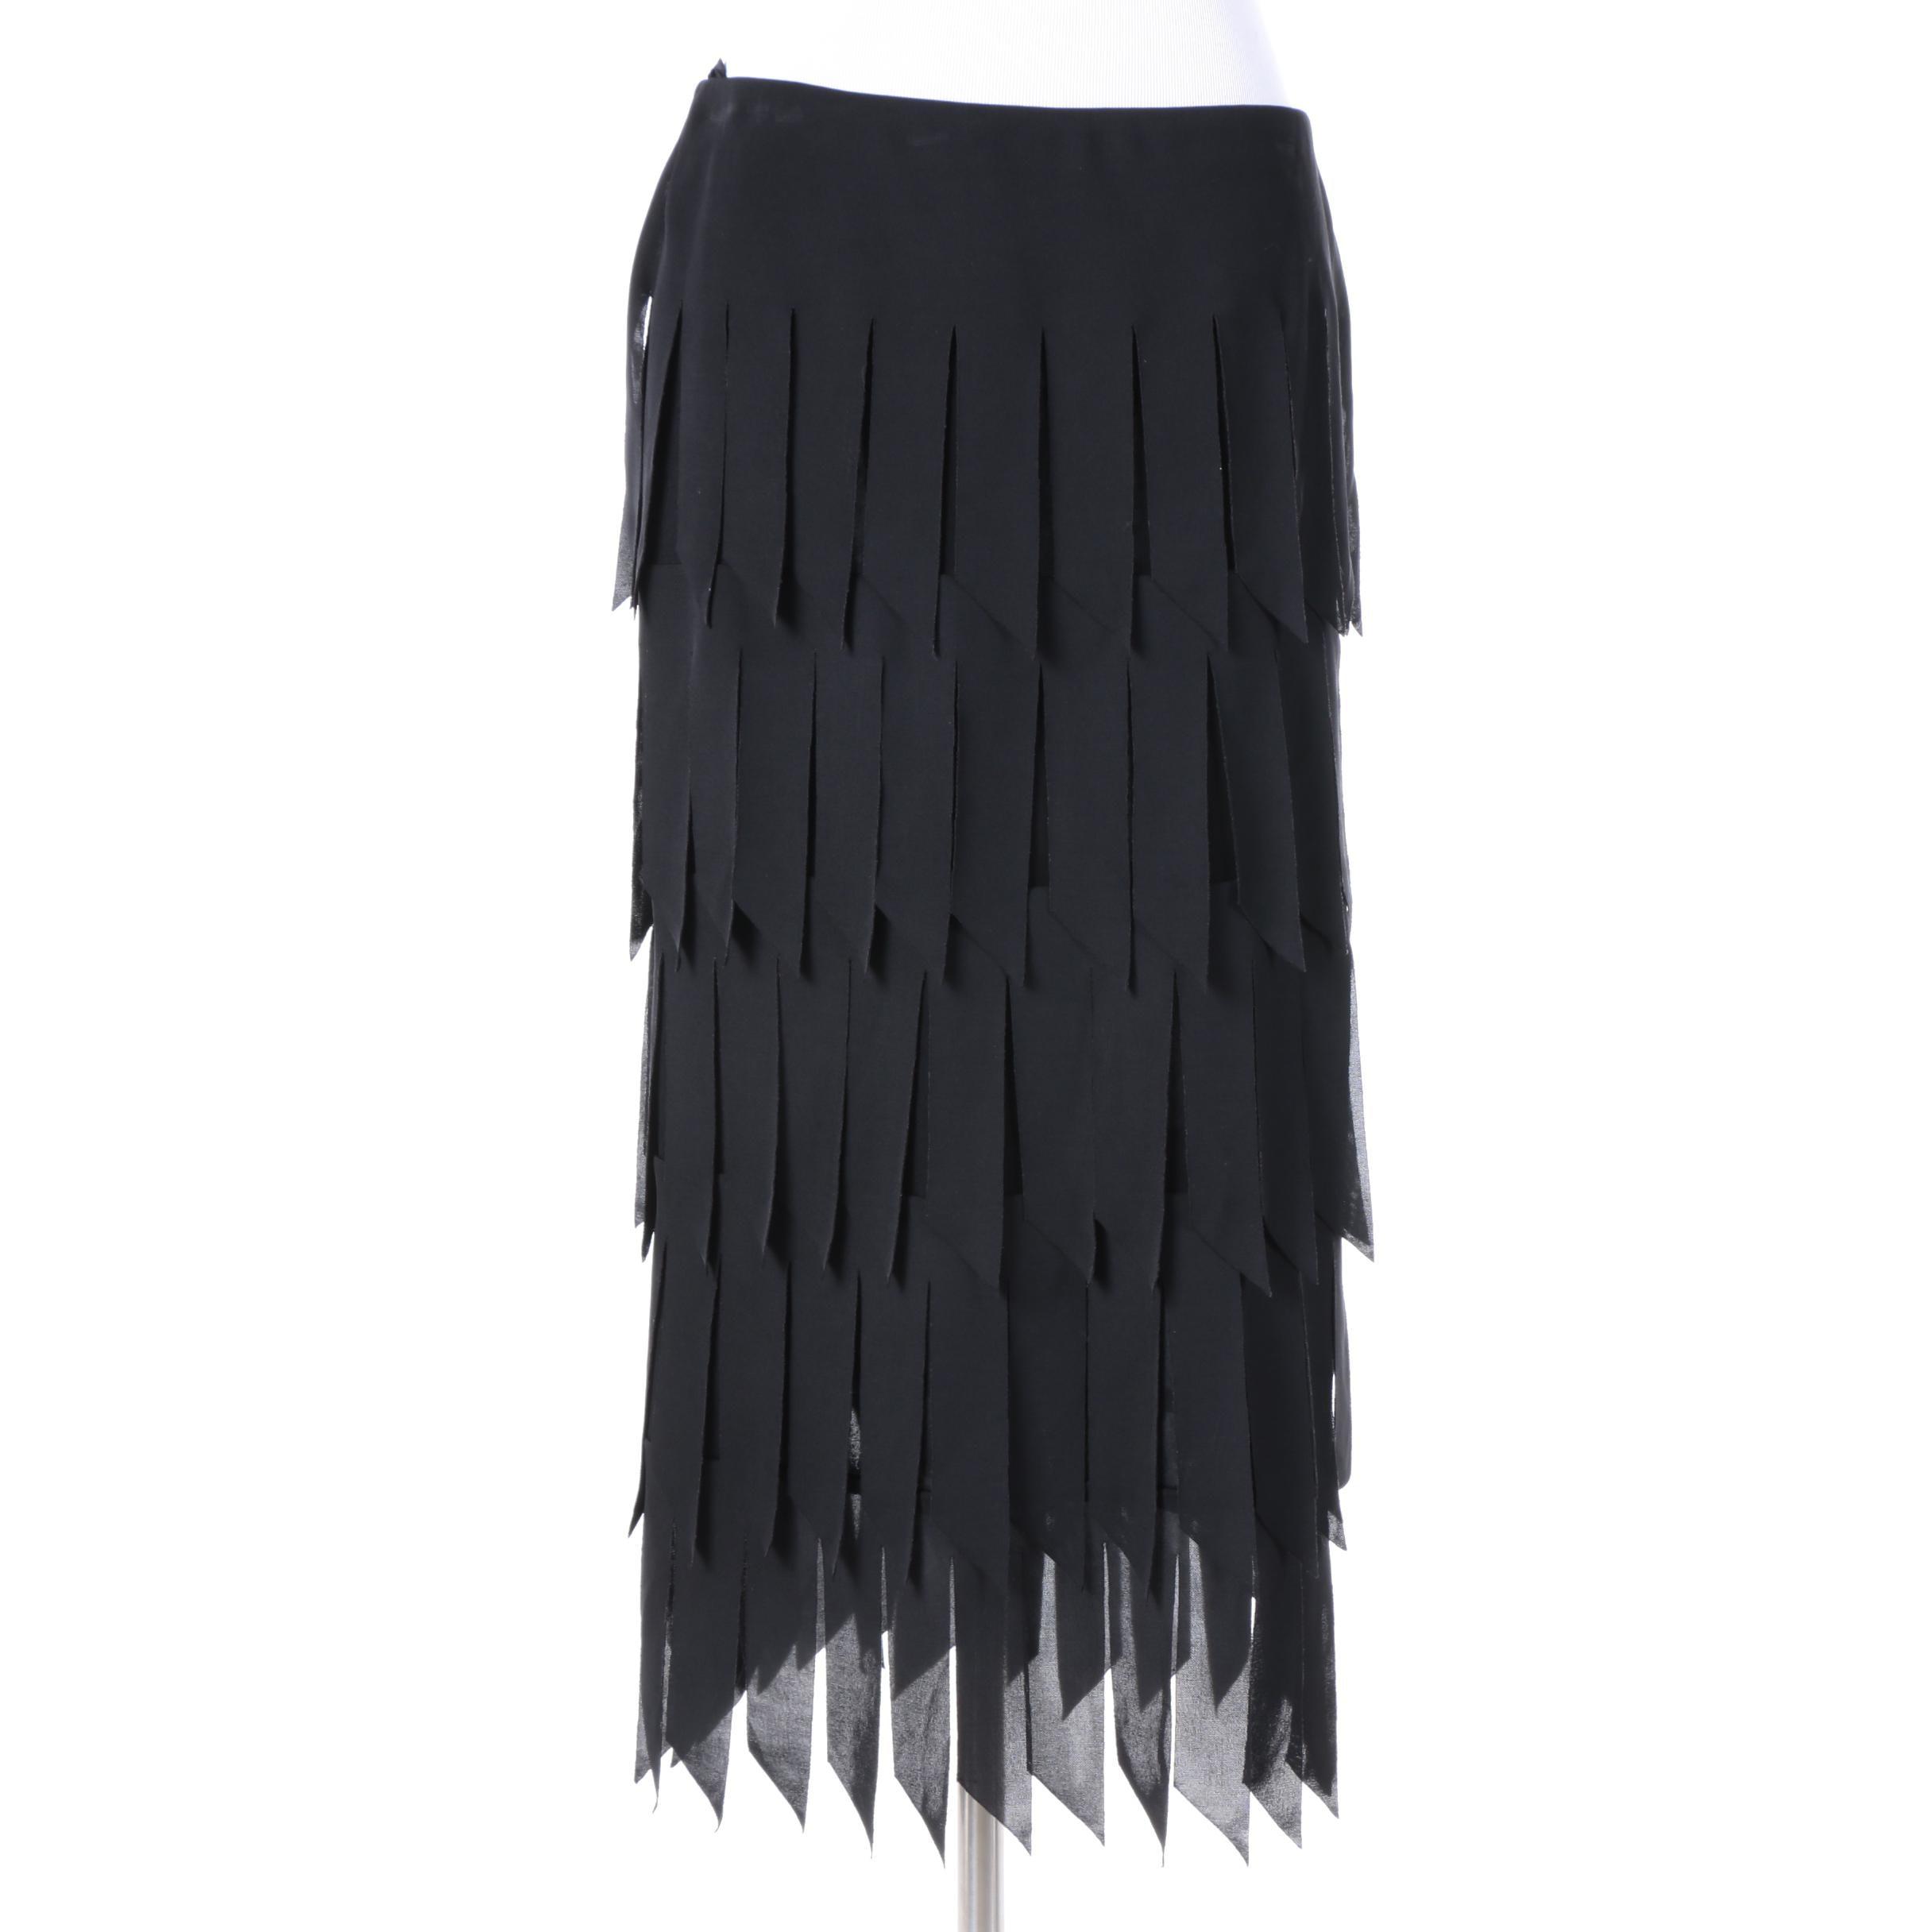 Tadashi Black Fringe Stretch Skirt